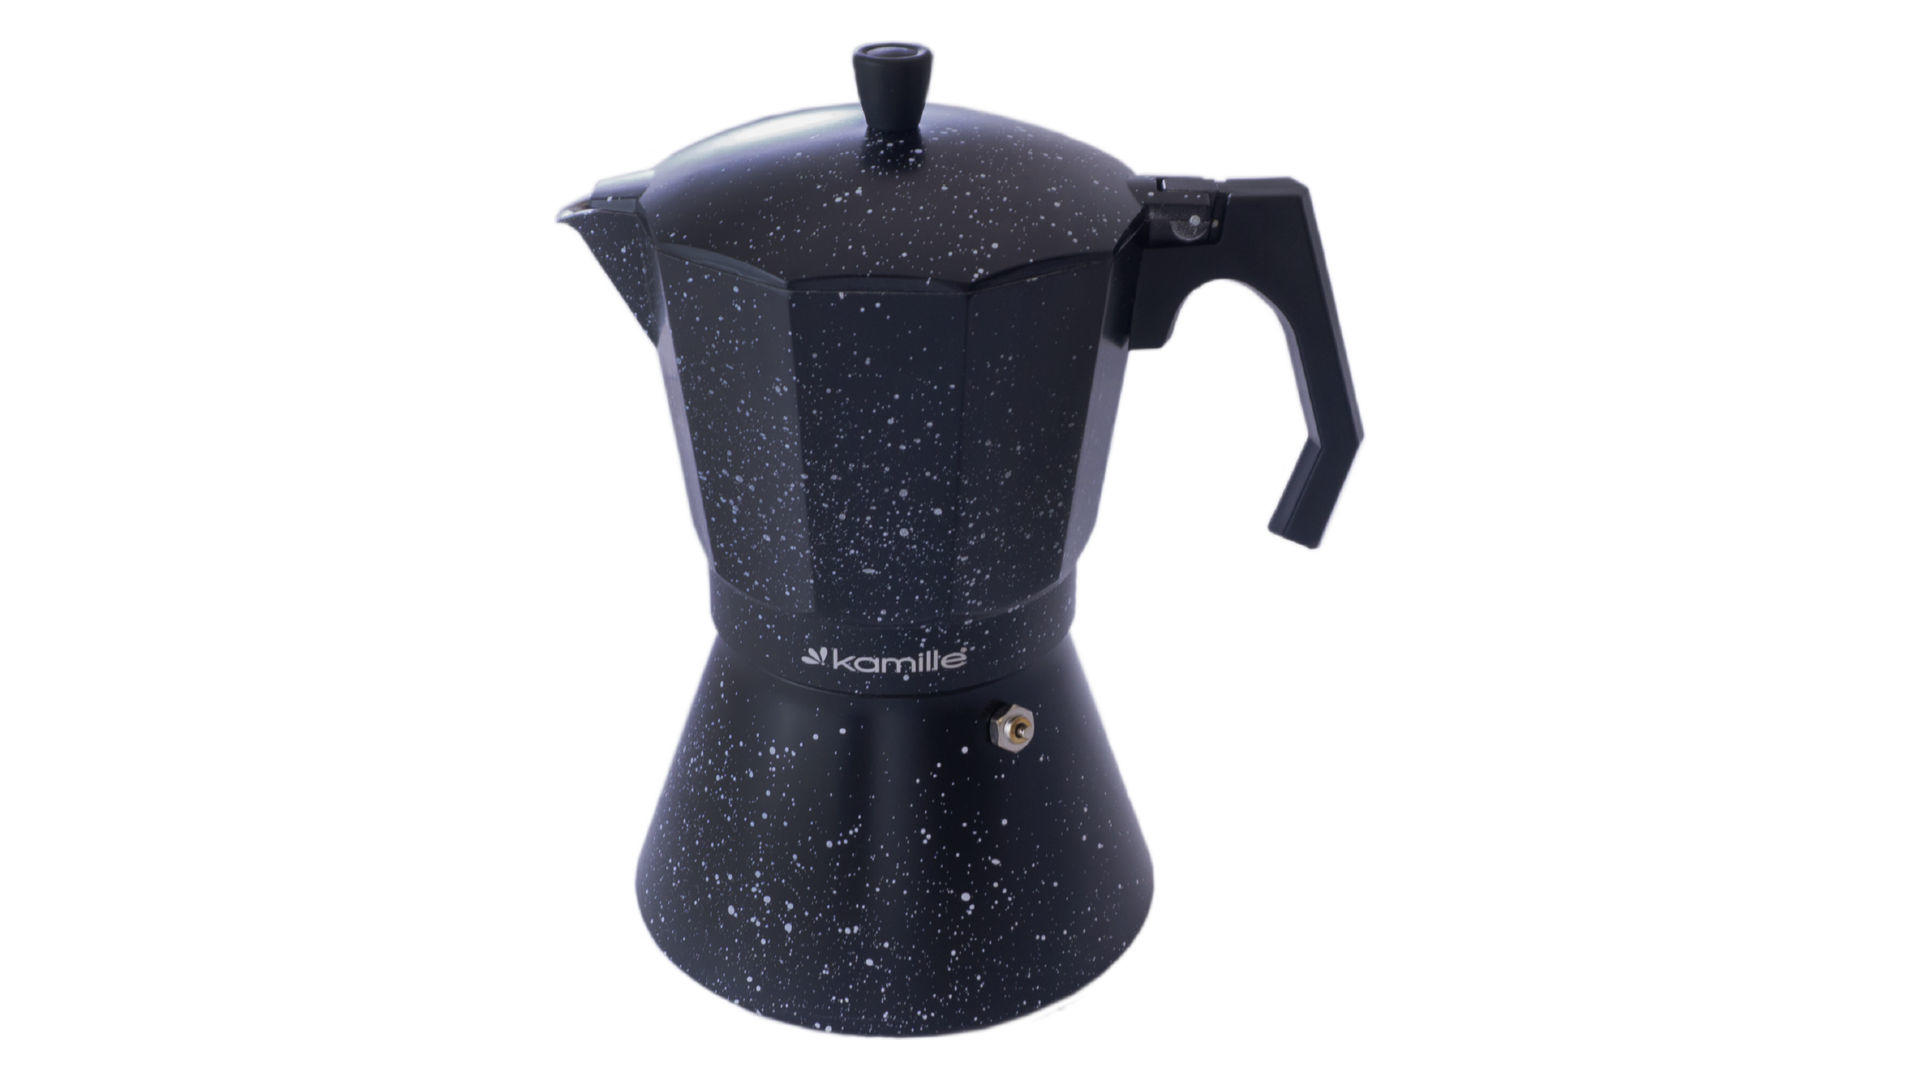 Кофеварка гейзерная алюминиевая Kamille - 600 мл  мрамор 8